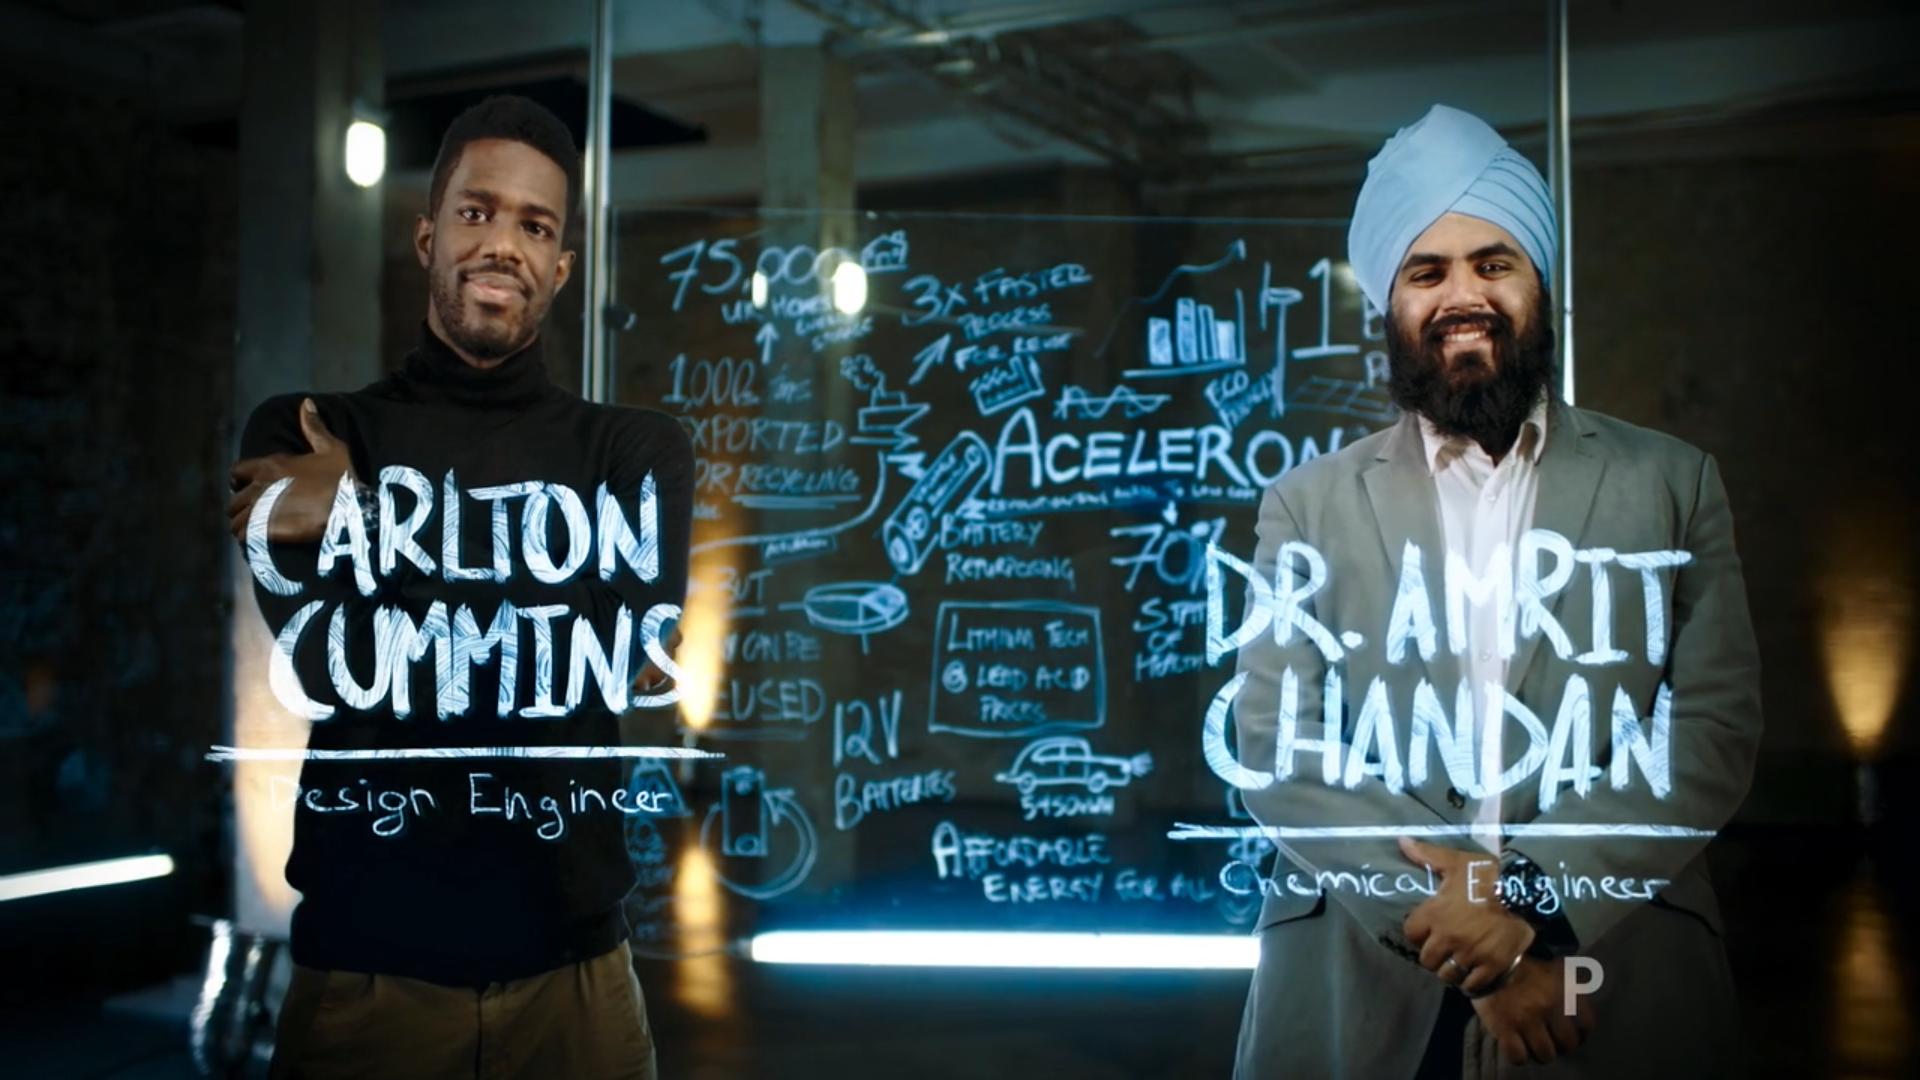 Casio Edifice sponsors Discovery - Next Gen Engineers 'Aceleron'